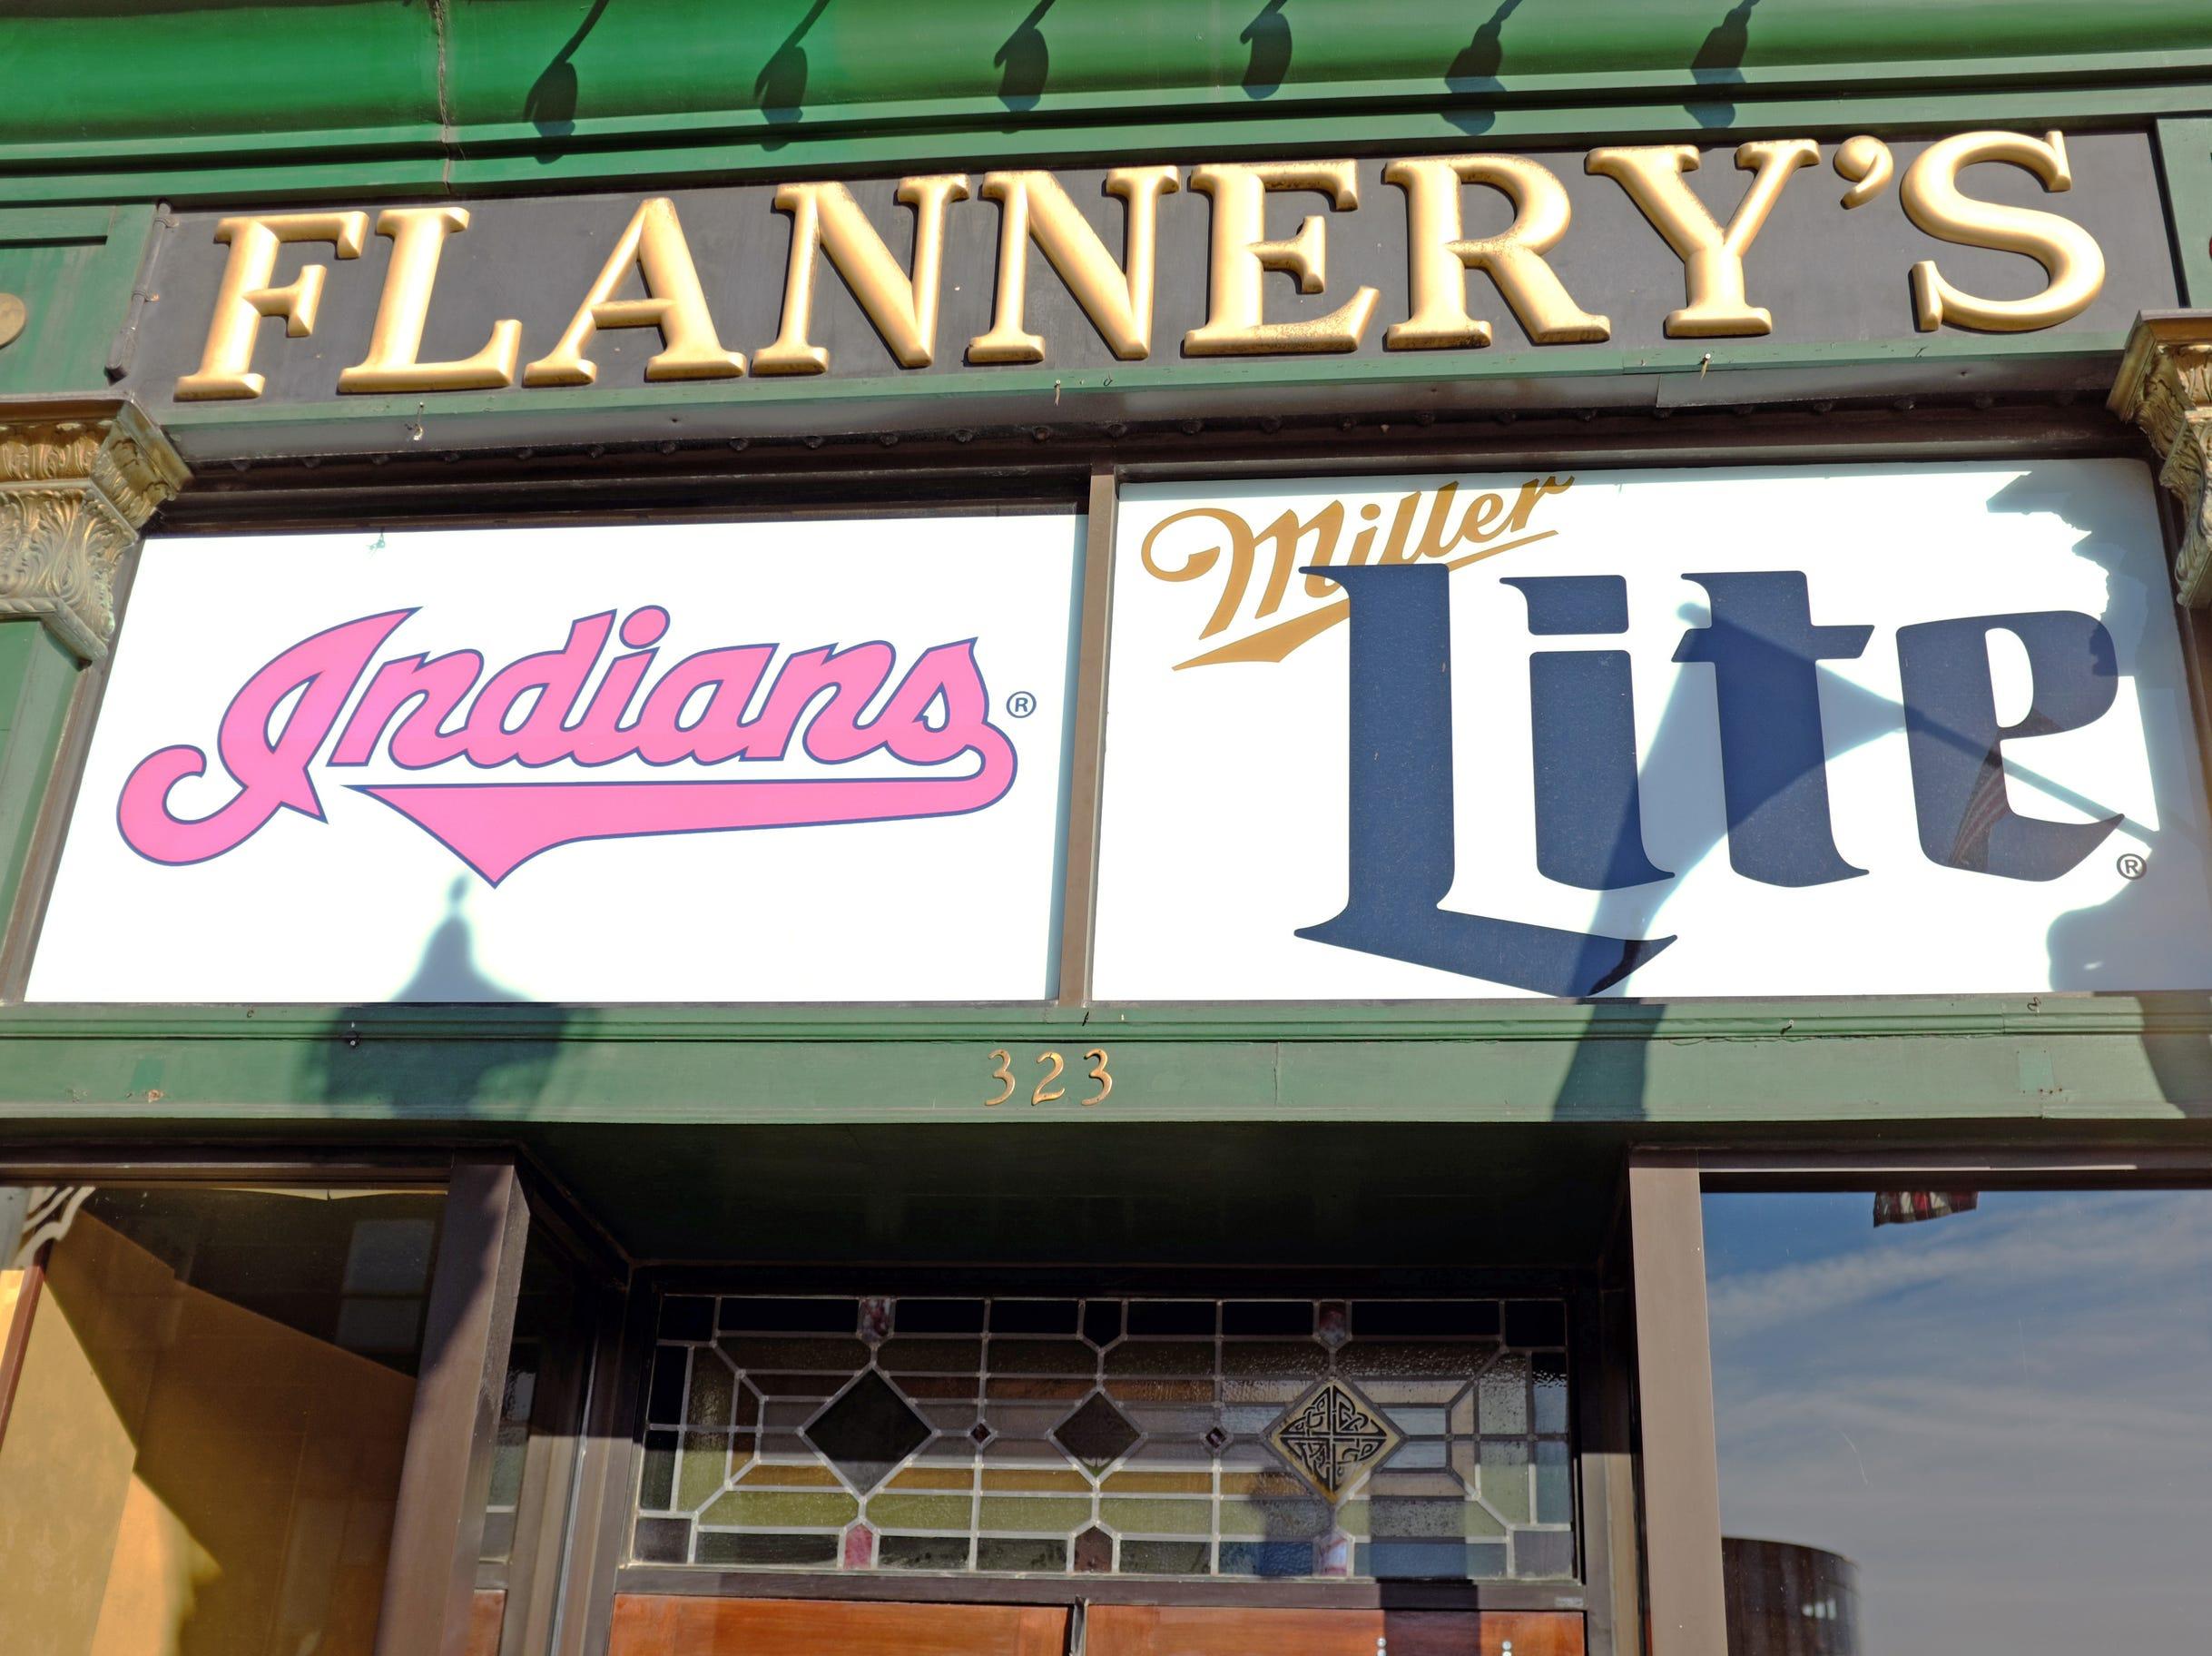 Cleveland Mark Jonathan Flannerys Pub